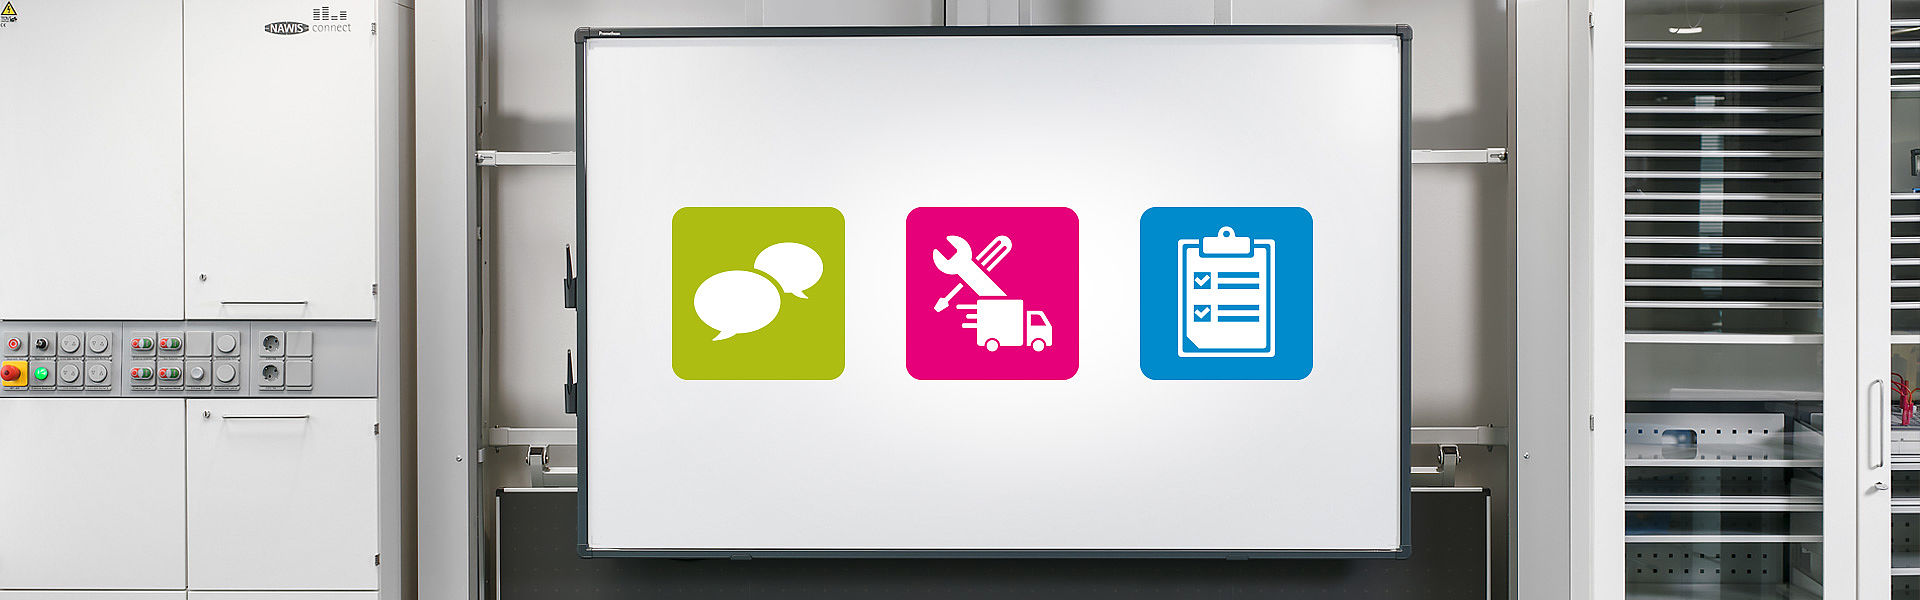 Bild: Hohenloher Interaktive Tafel mit Service Icons